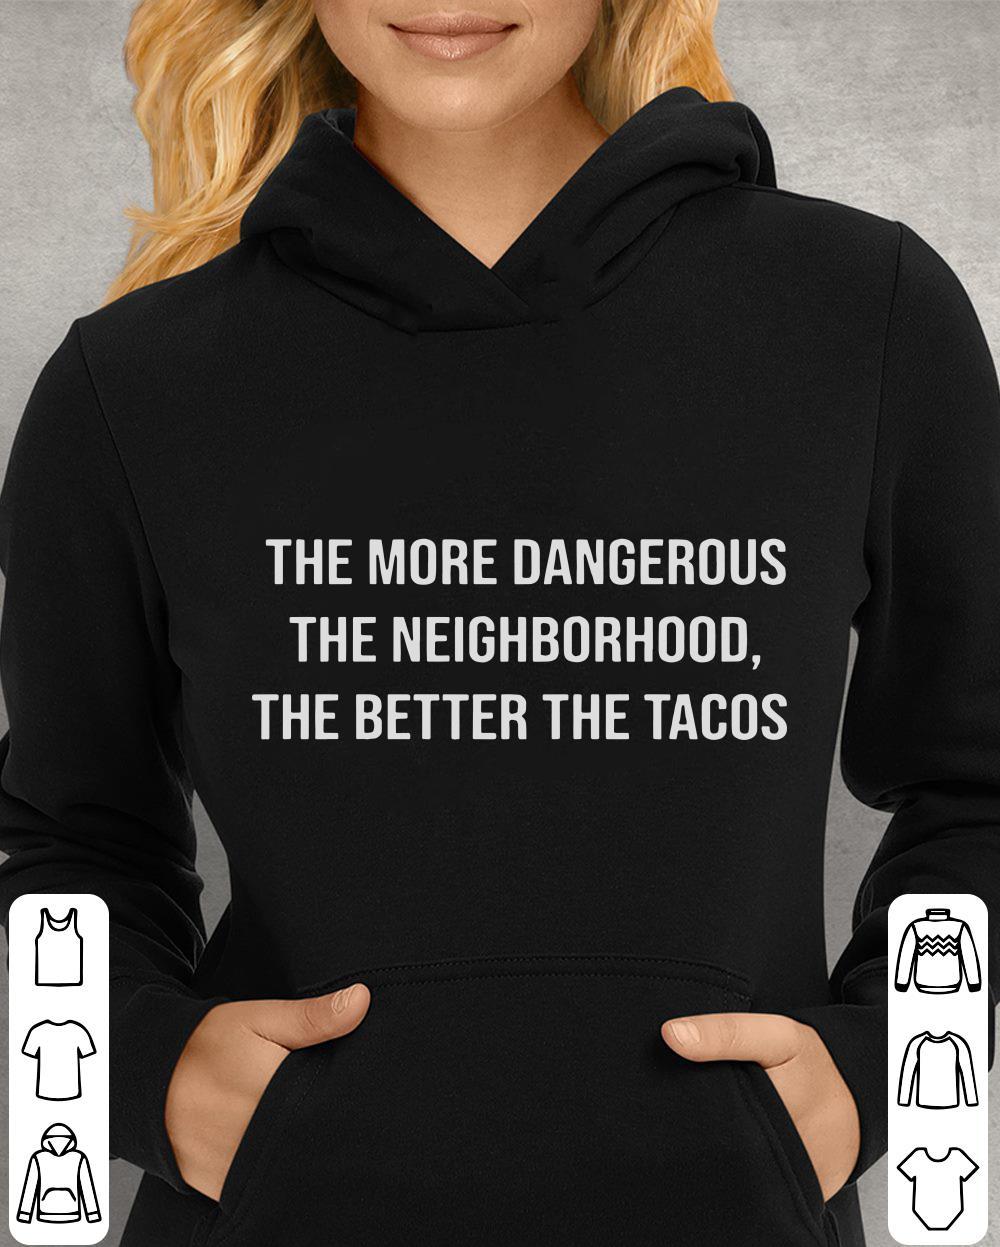 https://unicornshirts.net/images/2018/11/The-more-dangerous-the-neighborhood-the-better-the-tacos-shirt_4.jpg